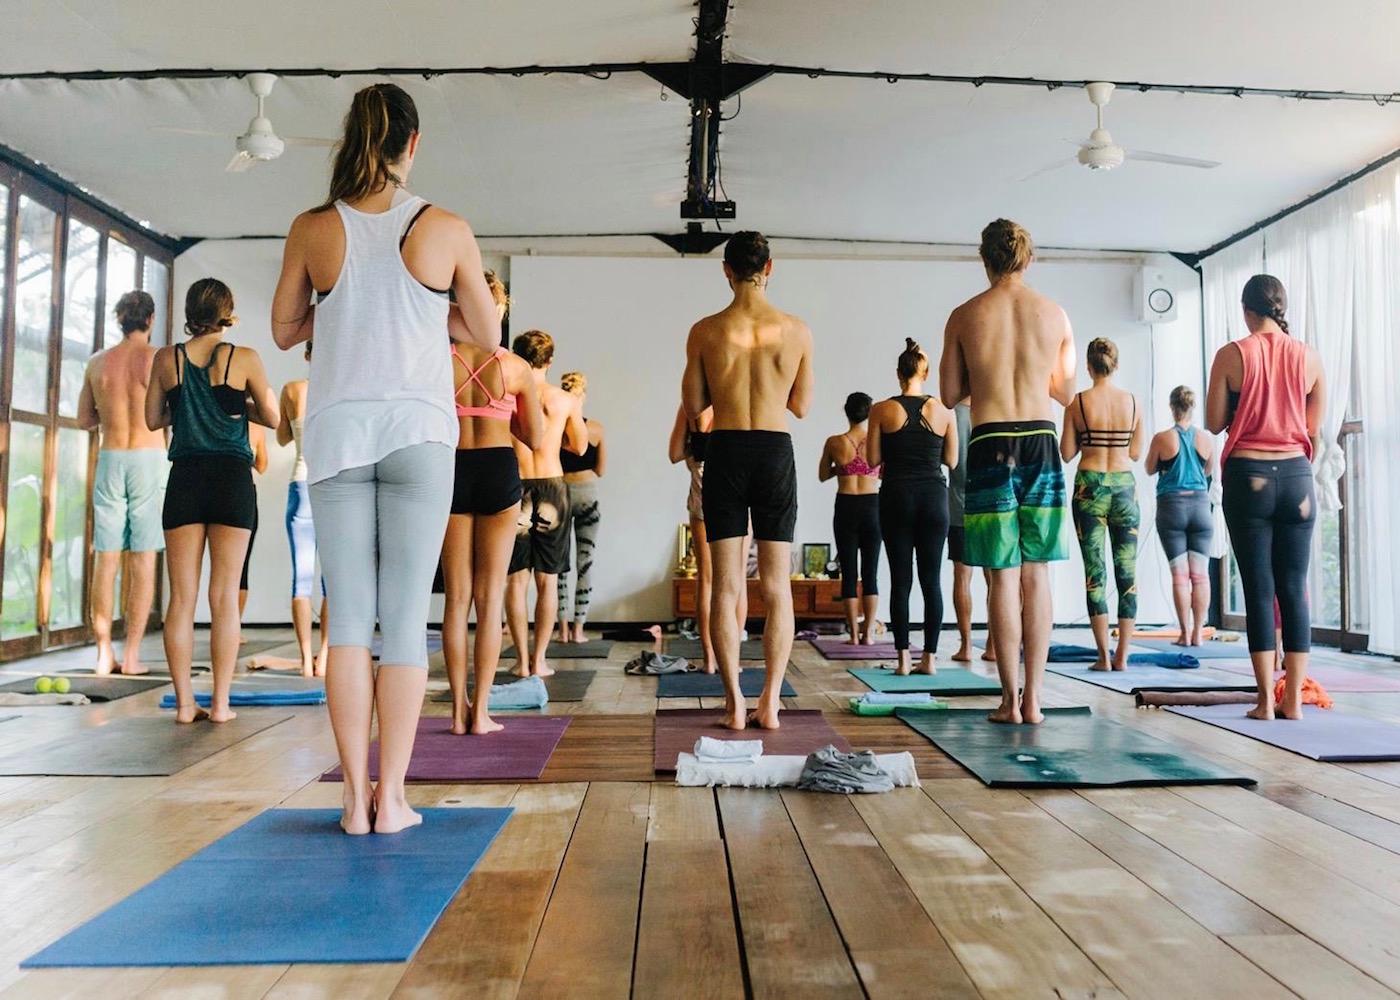 Yogis at Samadi yoga studio in Canggu, Bali, Indonesia